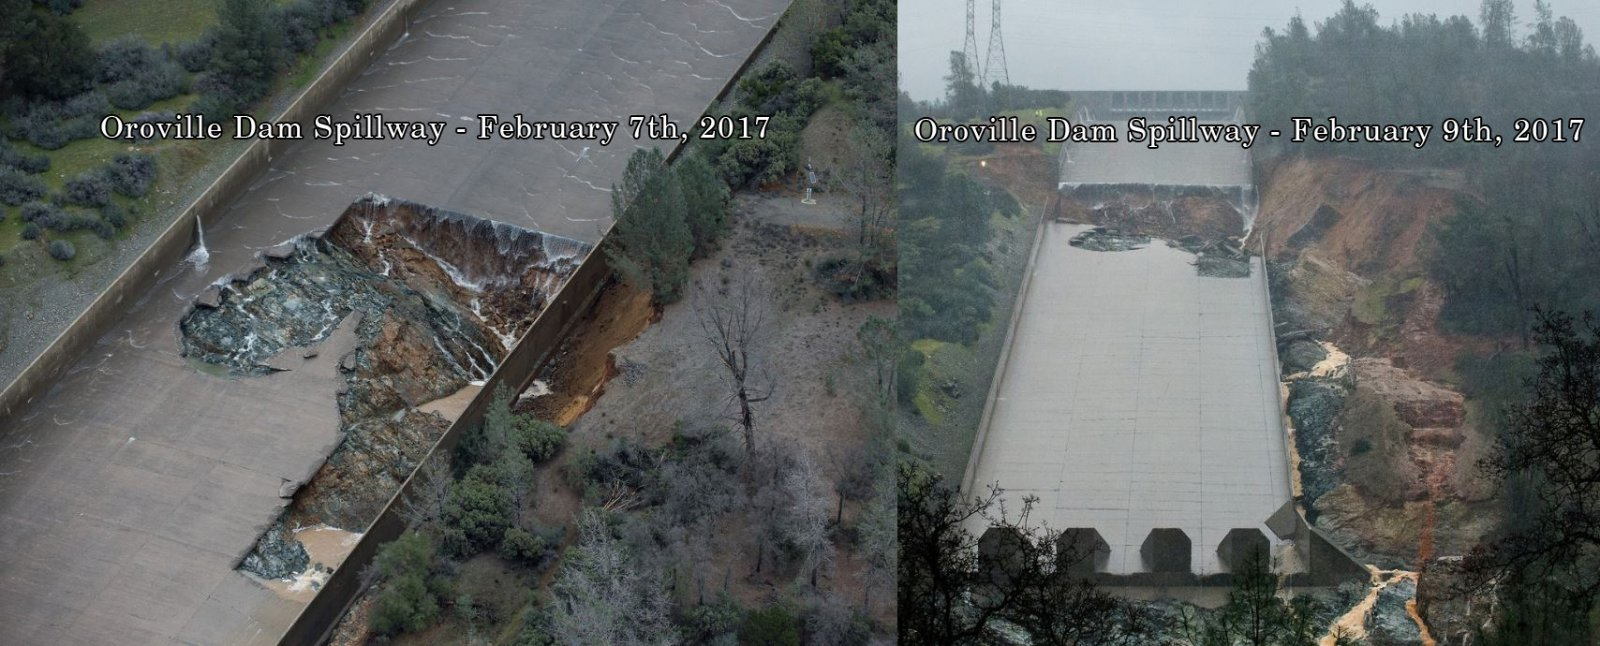 oroville spillway Feb 7-9.